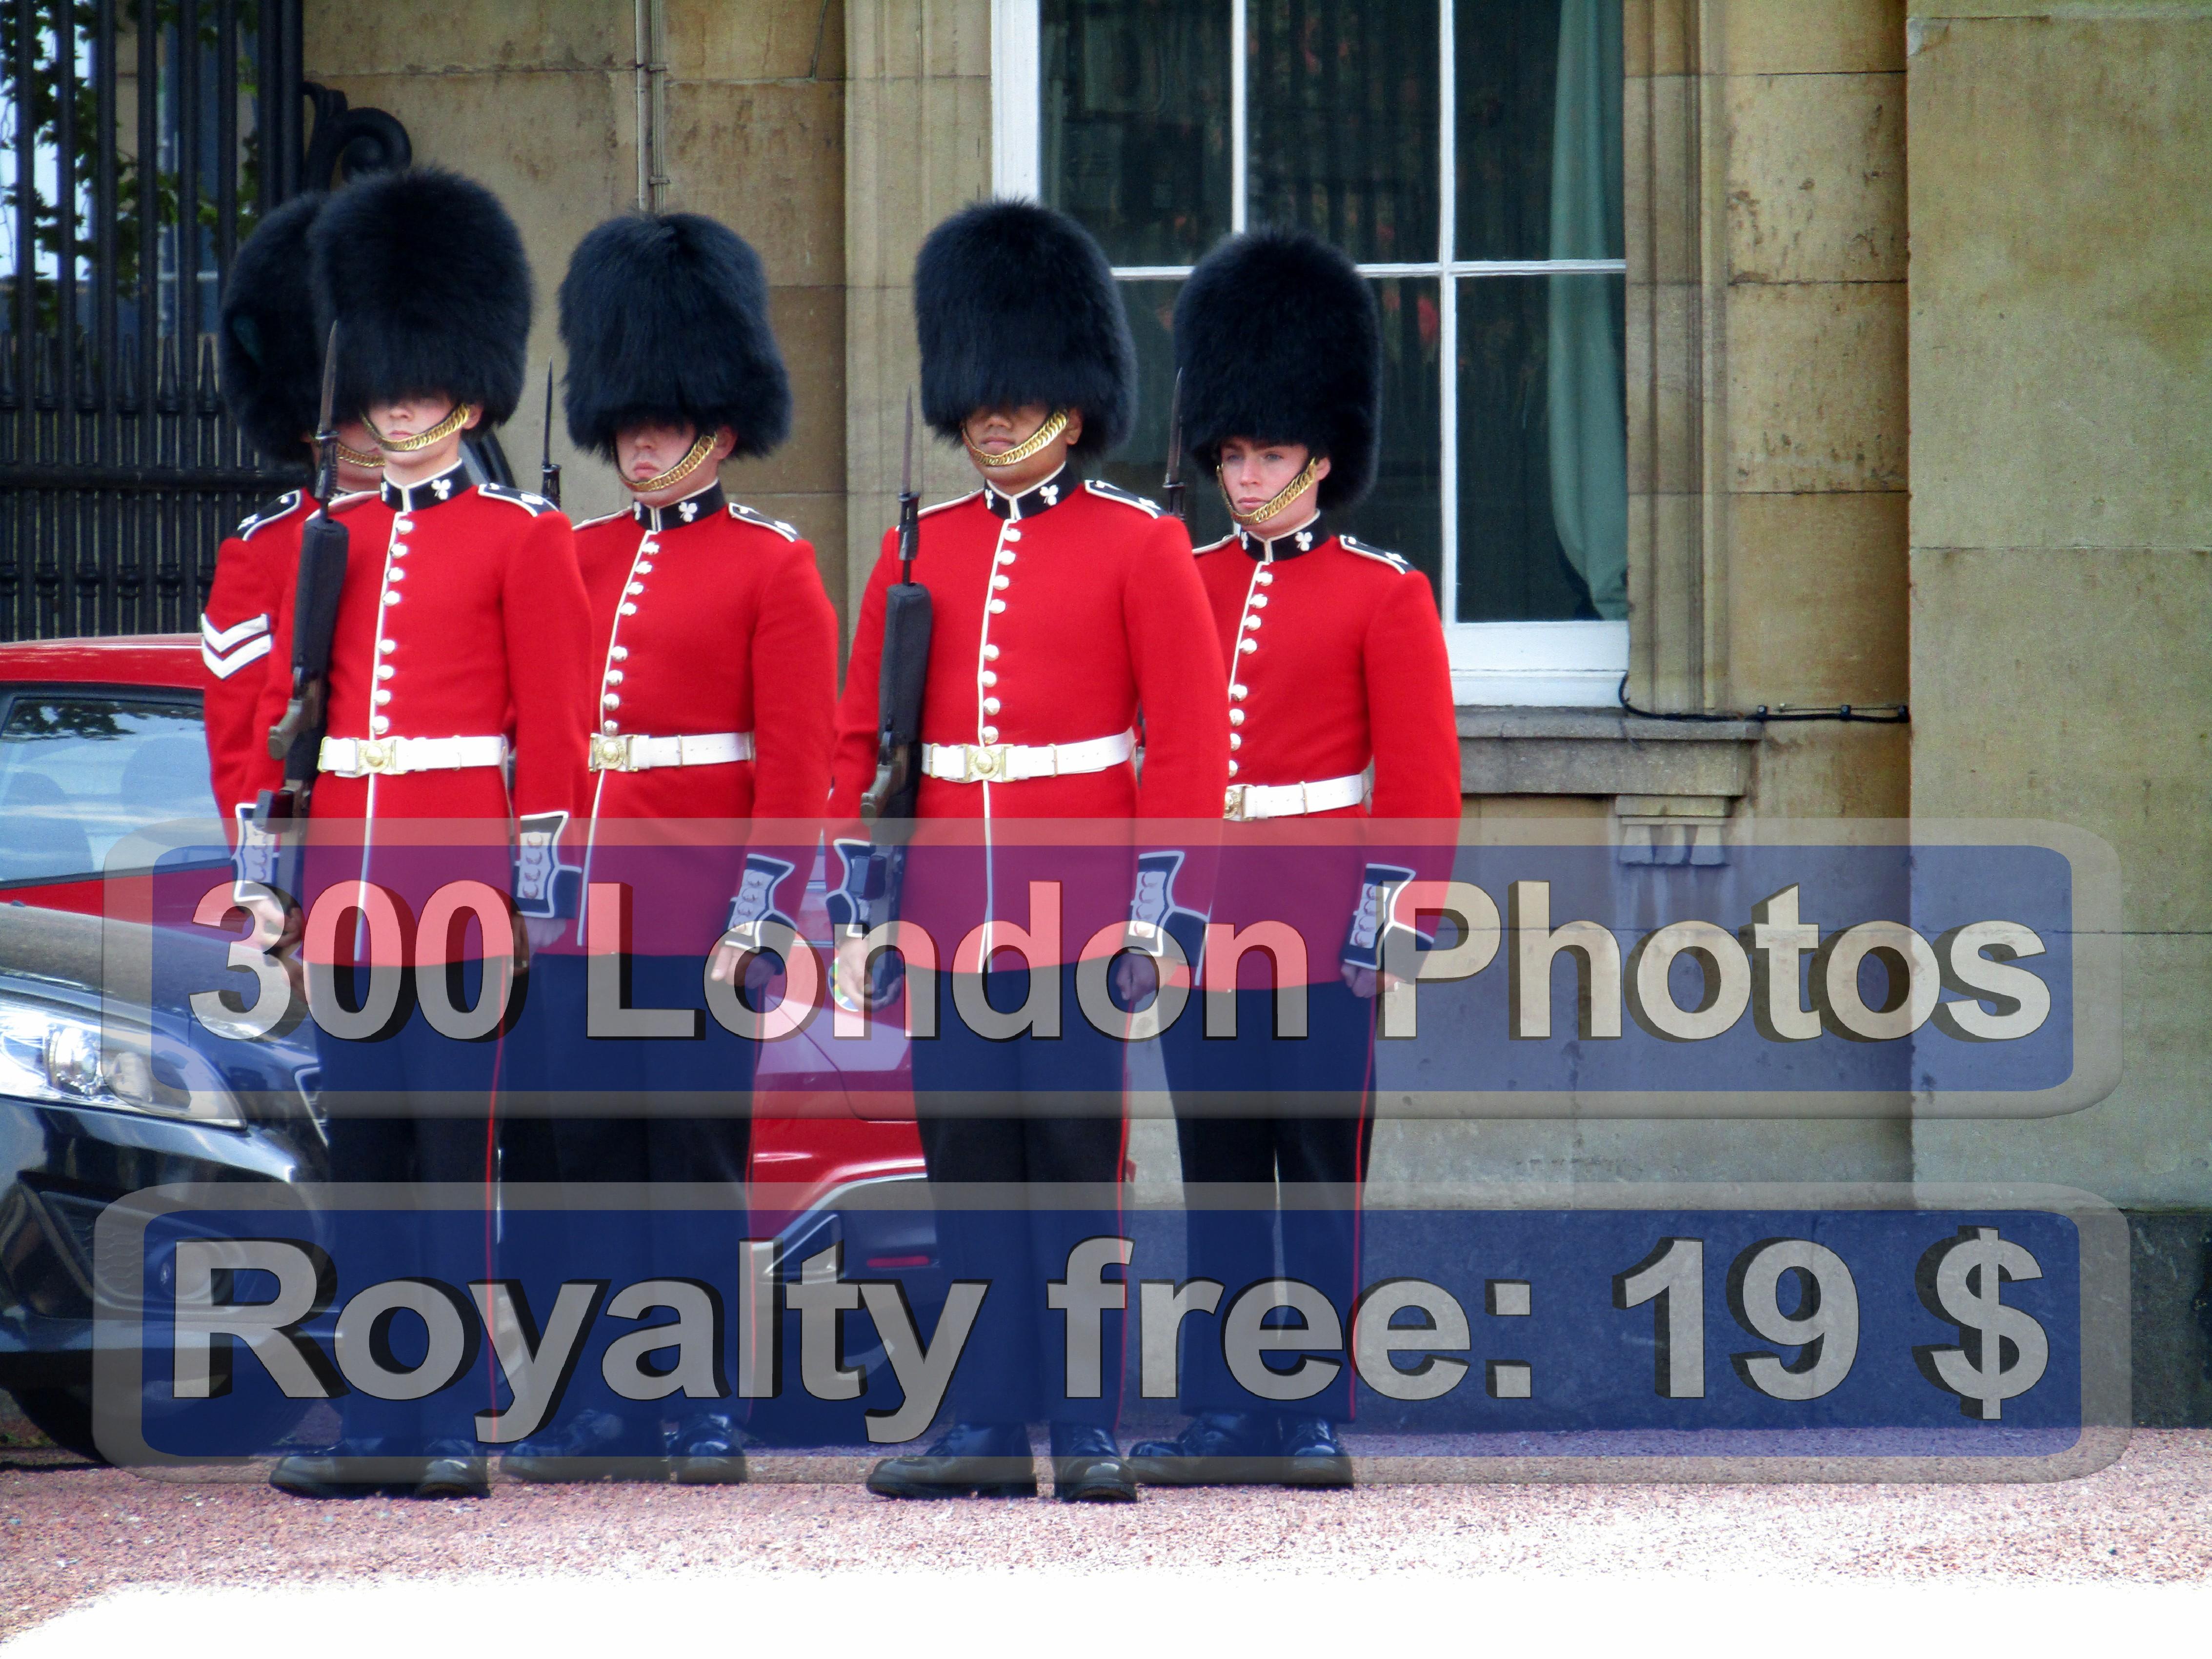 The London Photo Festival